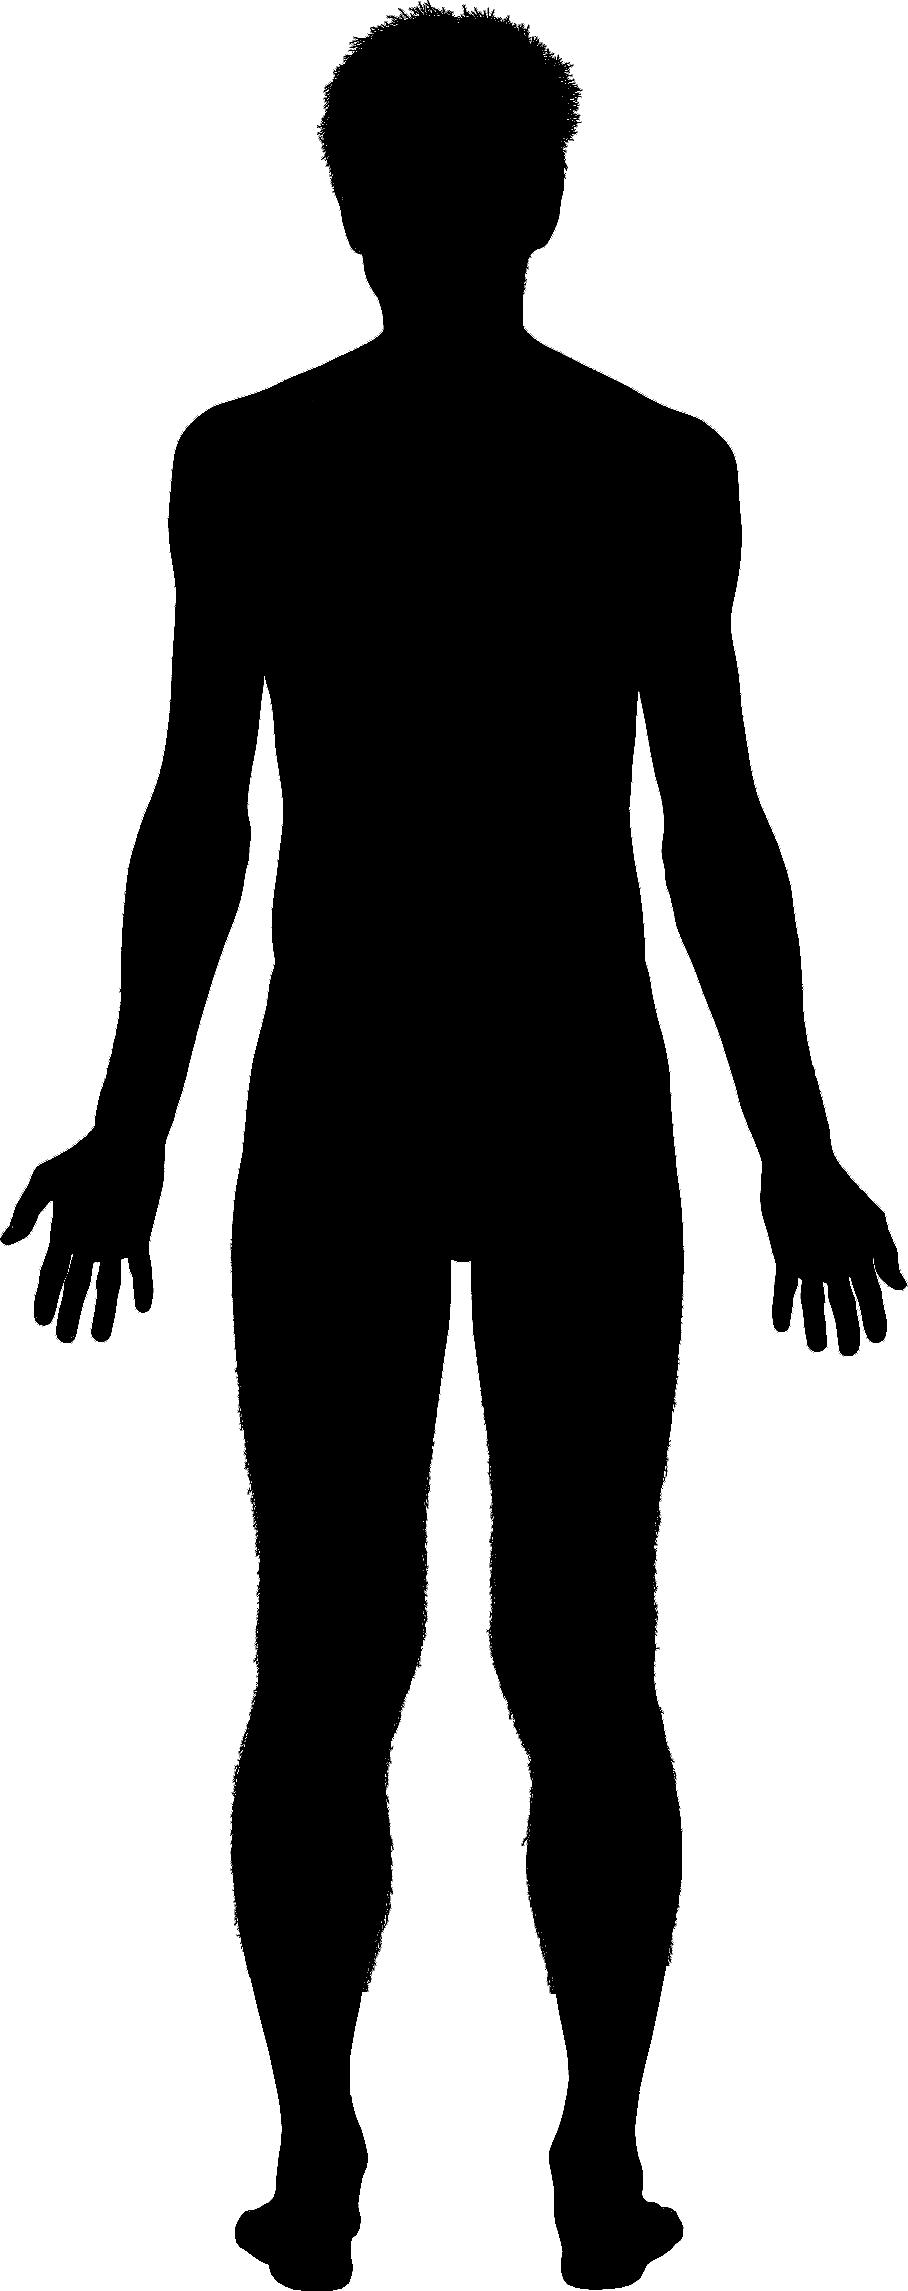 Free Human Body Silhouette, Download Free Clip Art, Free.